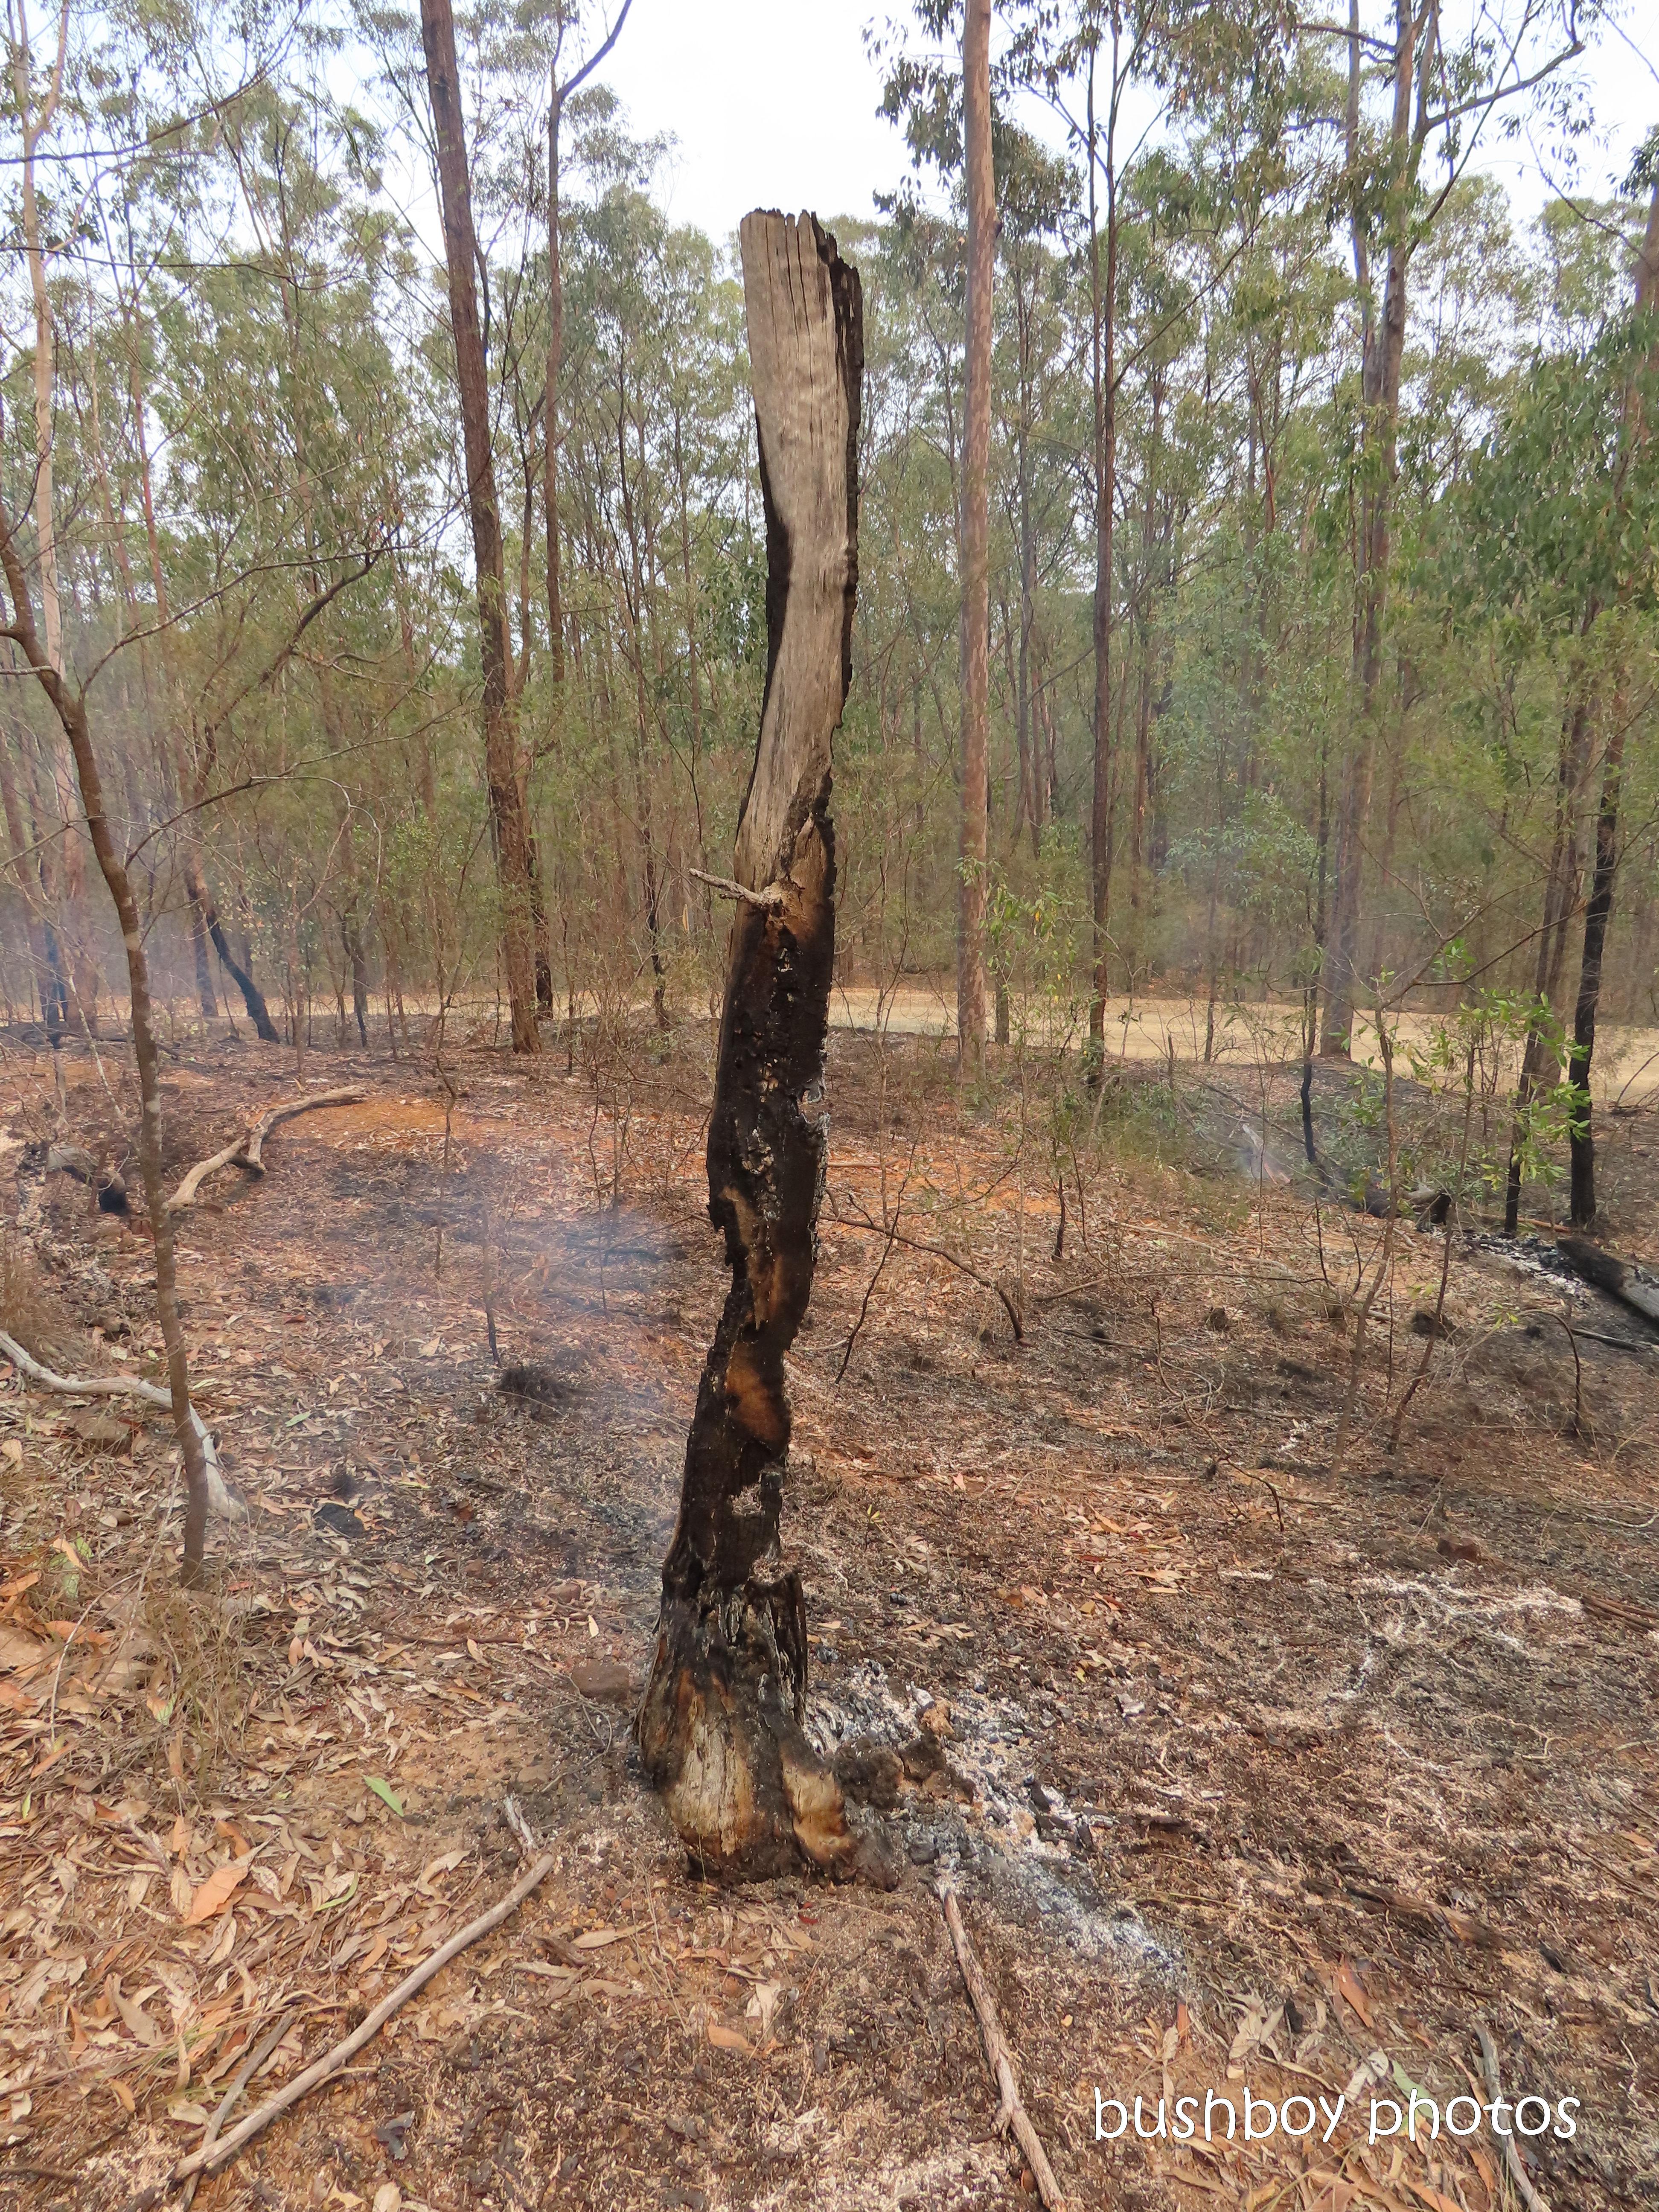 fire_old_tree_smoke_named_home_jackadgery_oct 2019